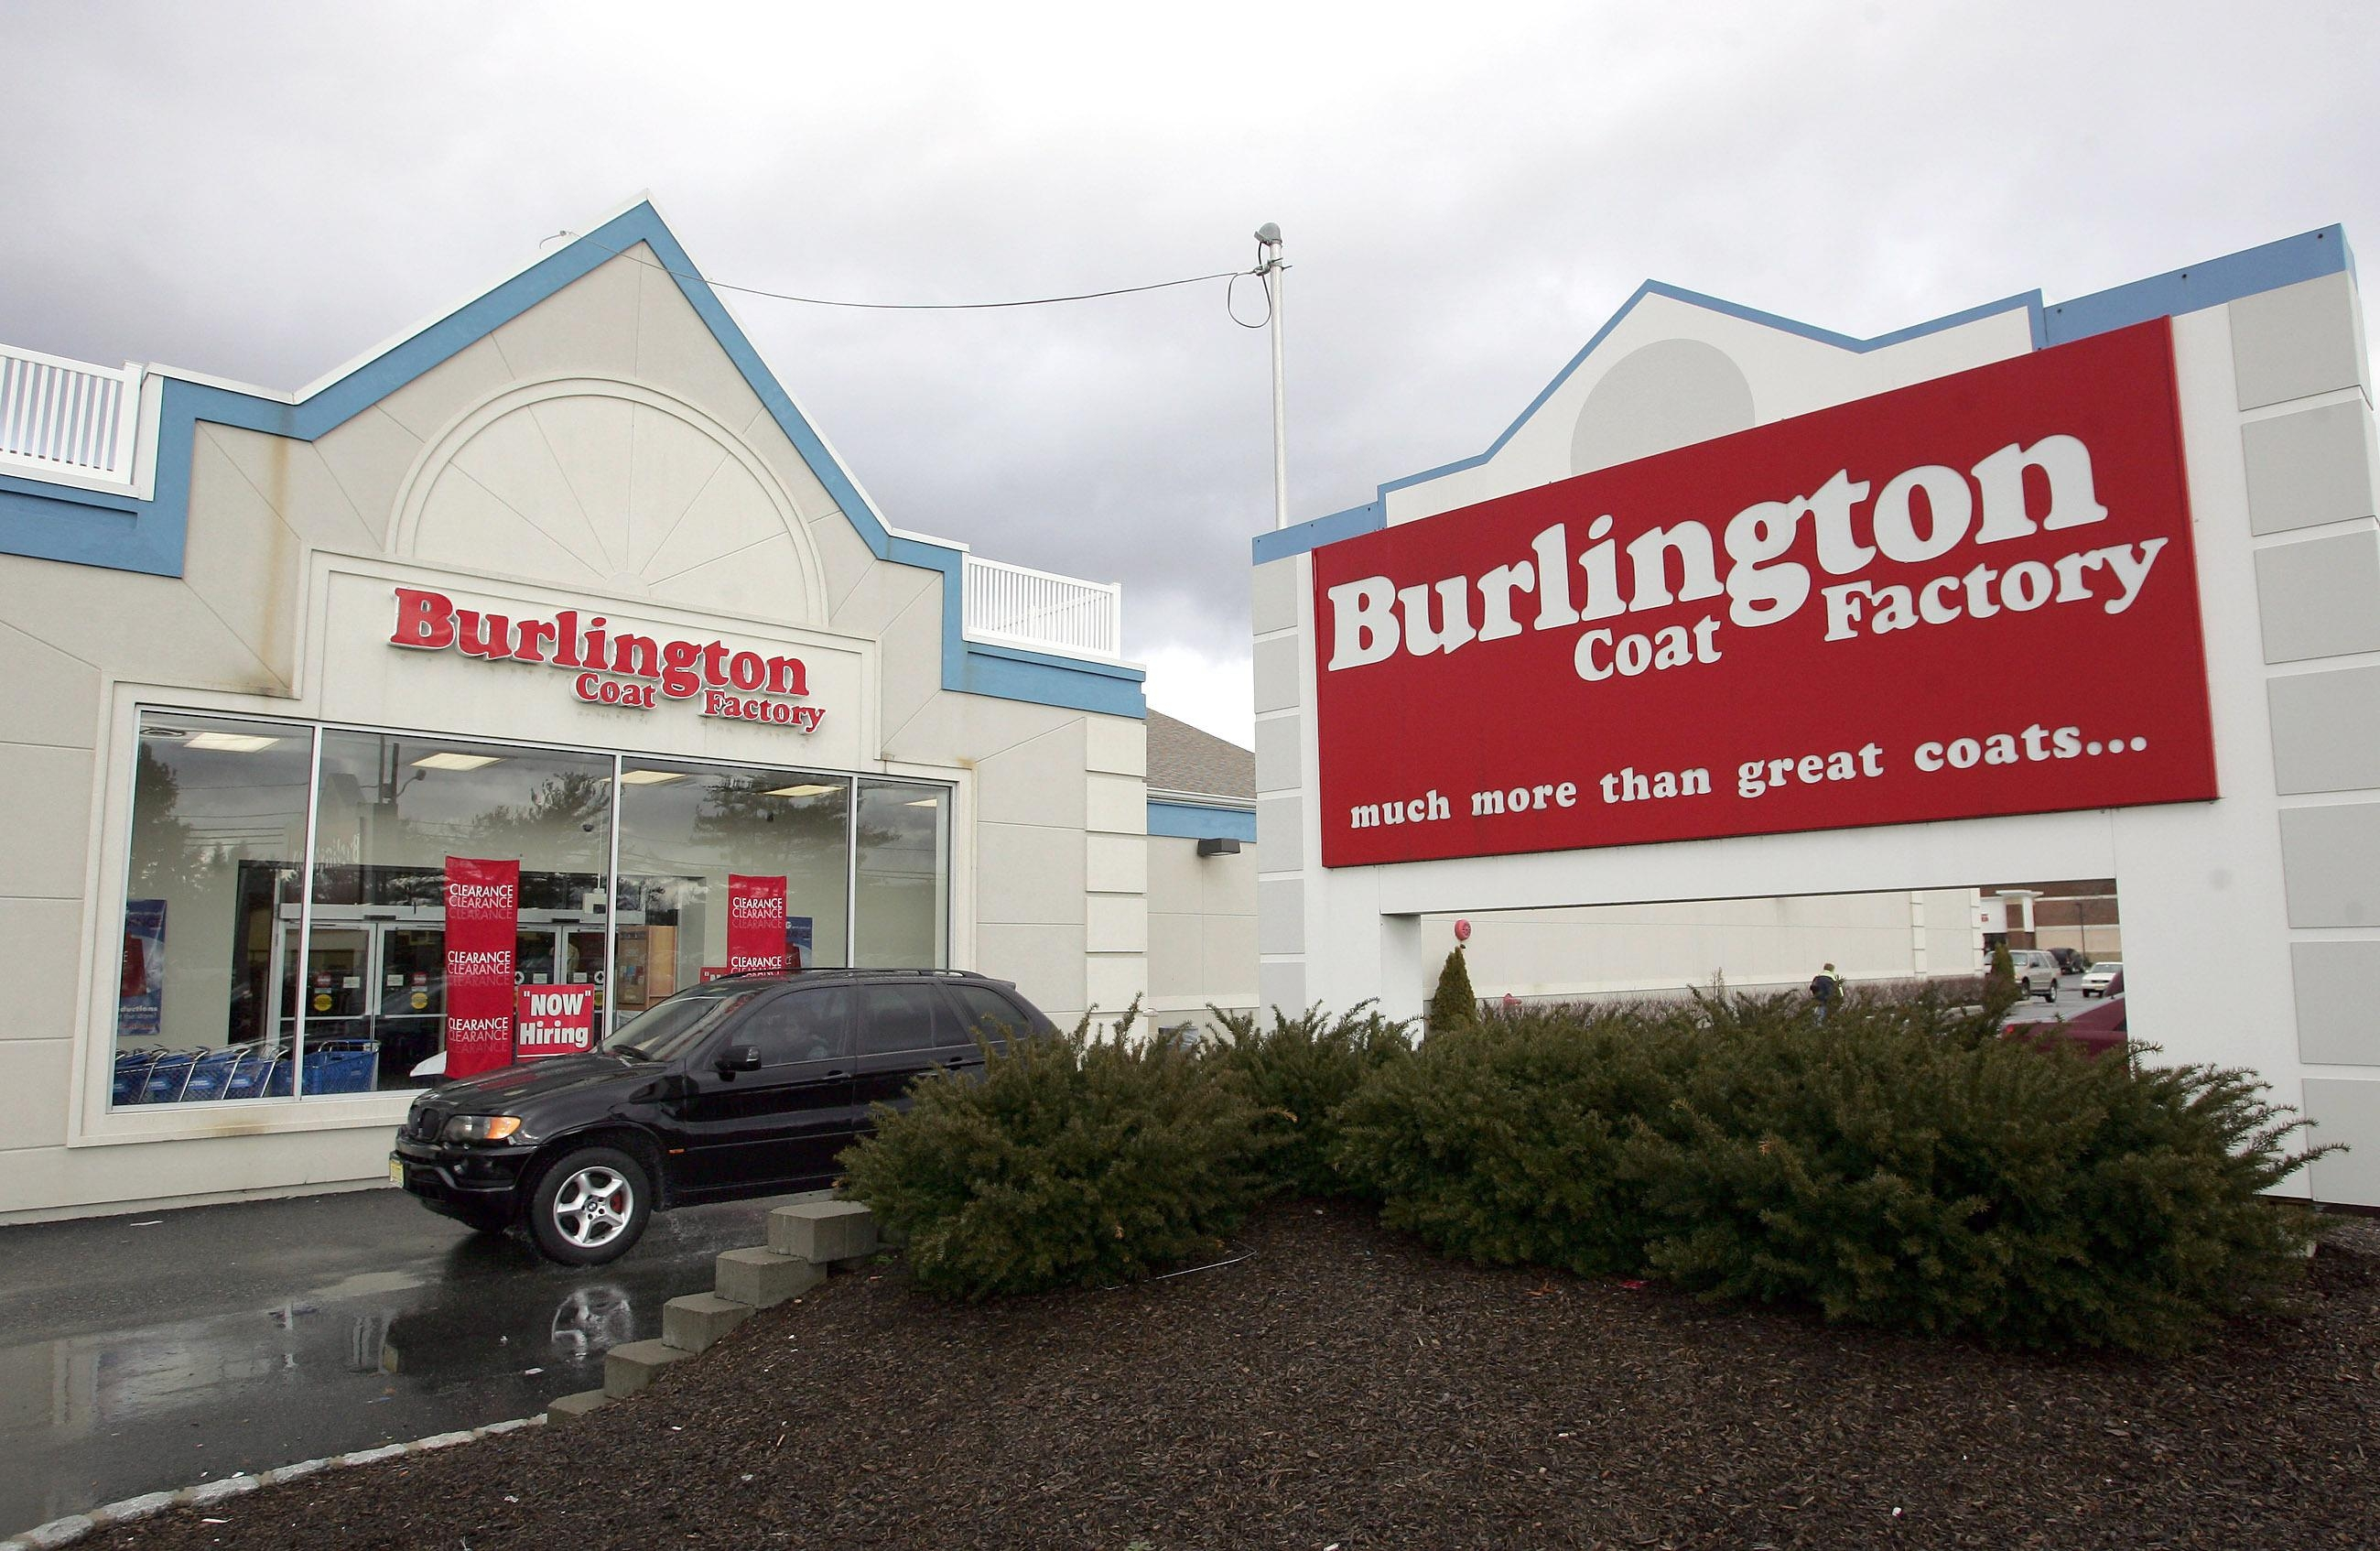 Collection Burlington Coat Factory Billerica Ma Pictures Pertaining To Burlington Coat Factory Wall Art (Image 10 of 20)